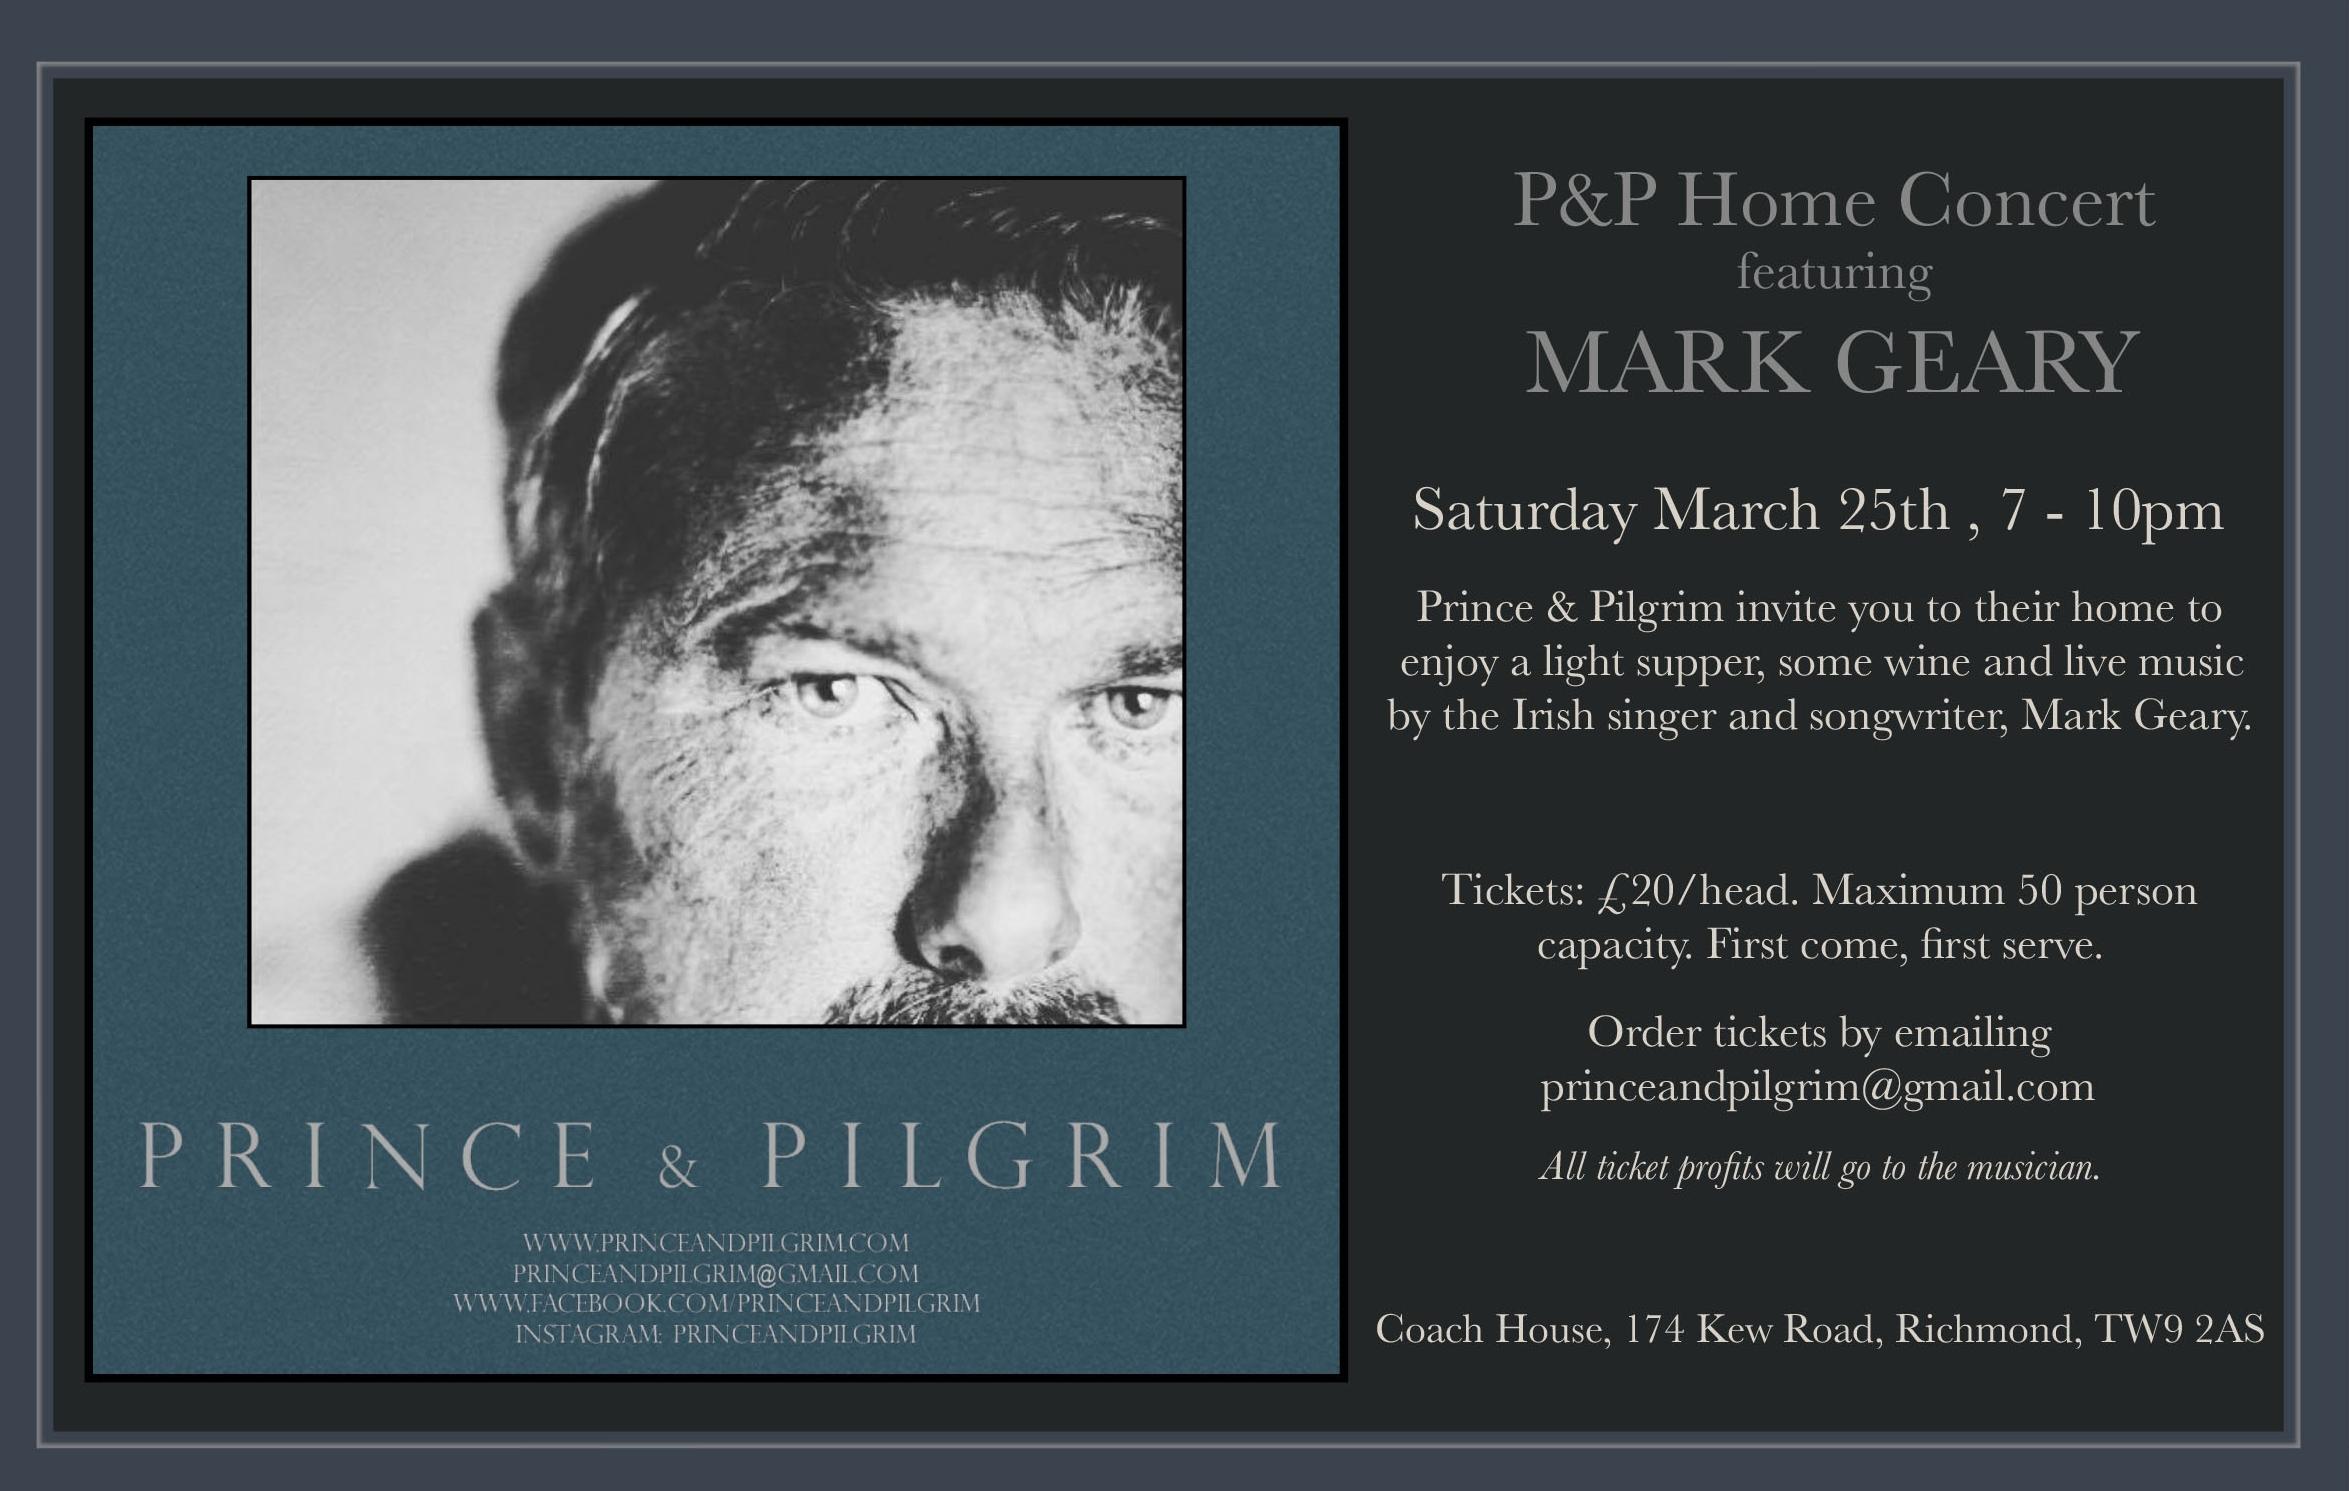 Mark Geary Concert Flyer-1.jpg